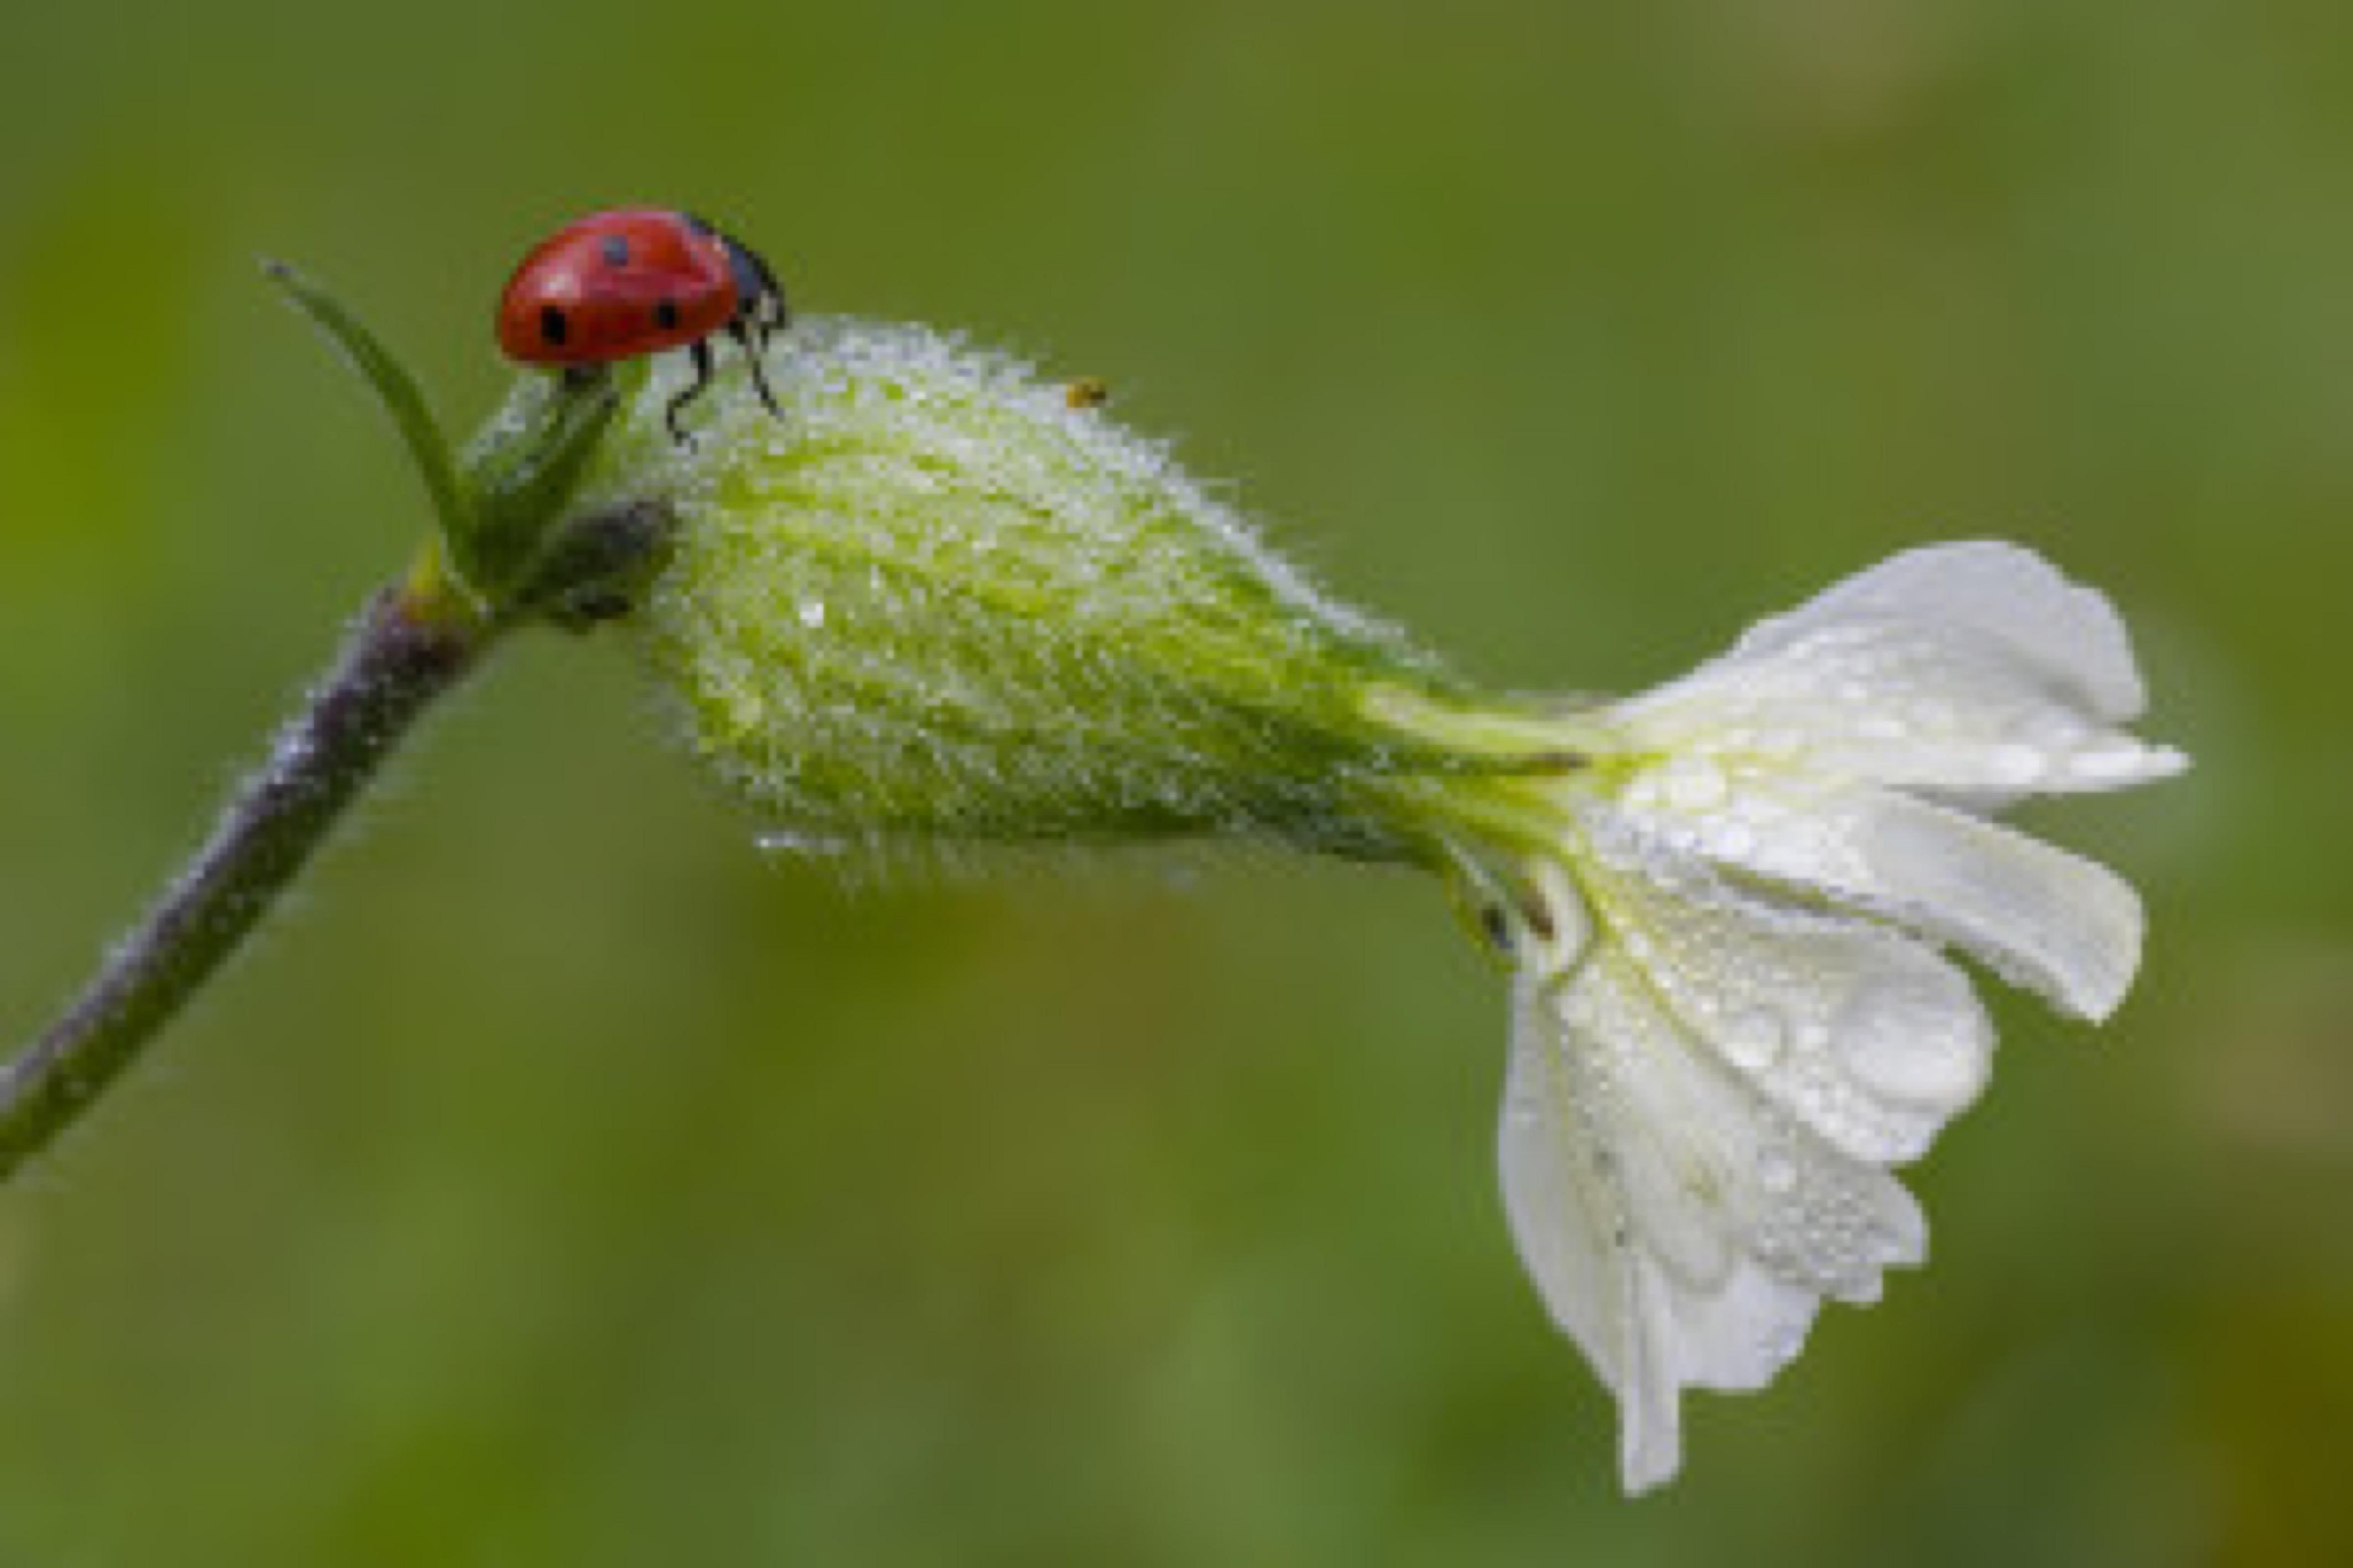 Ladybug on Saponaria white flower witn dew drops